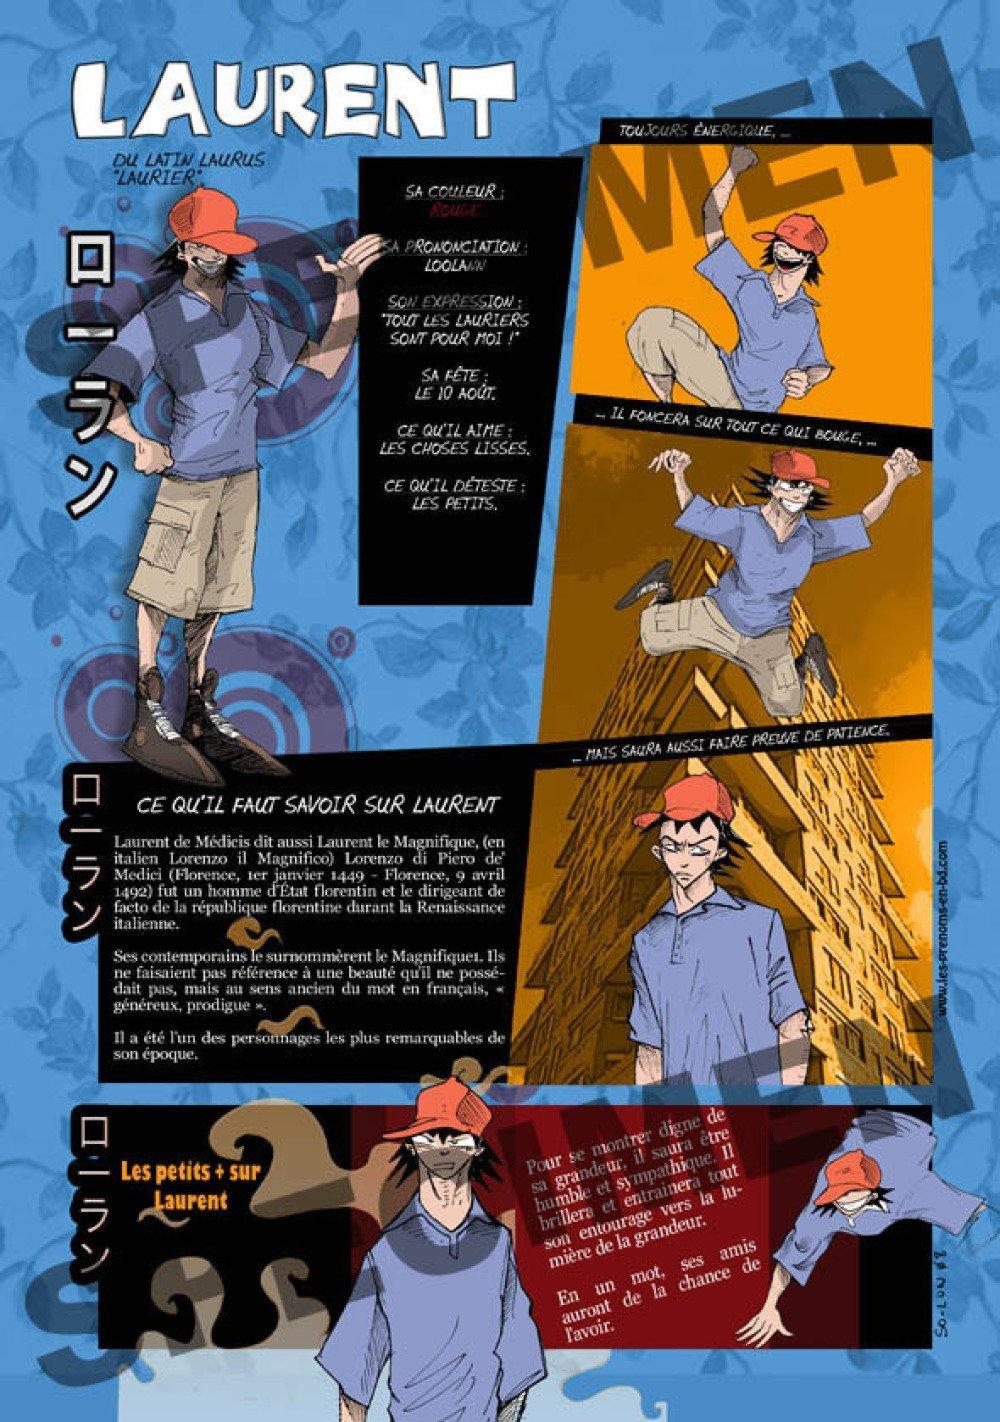 Prénom Manga Laurent